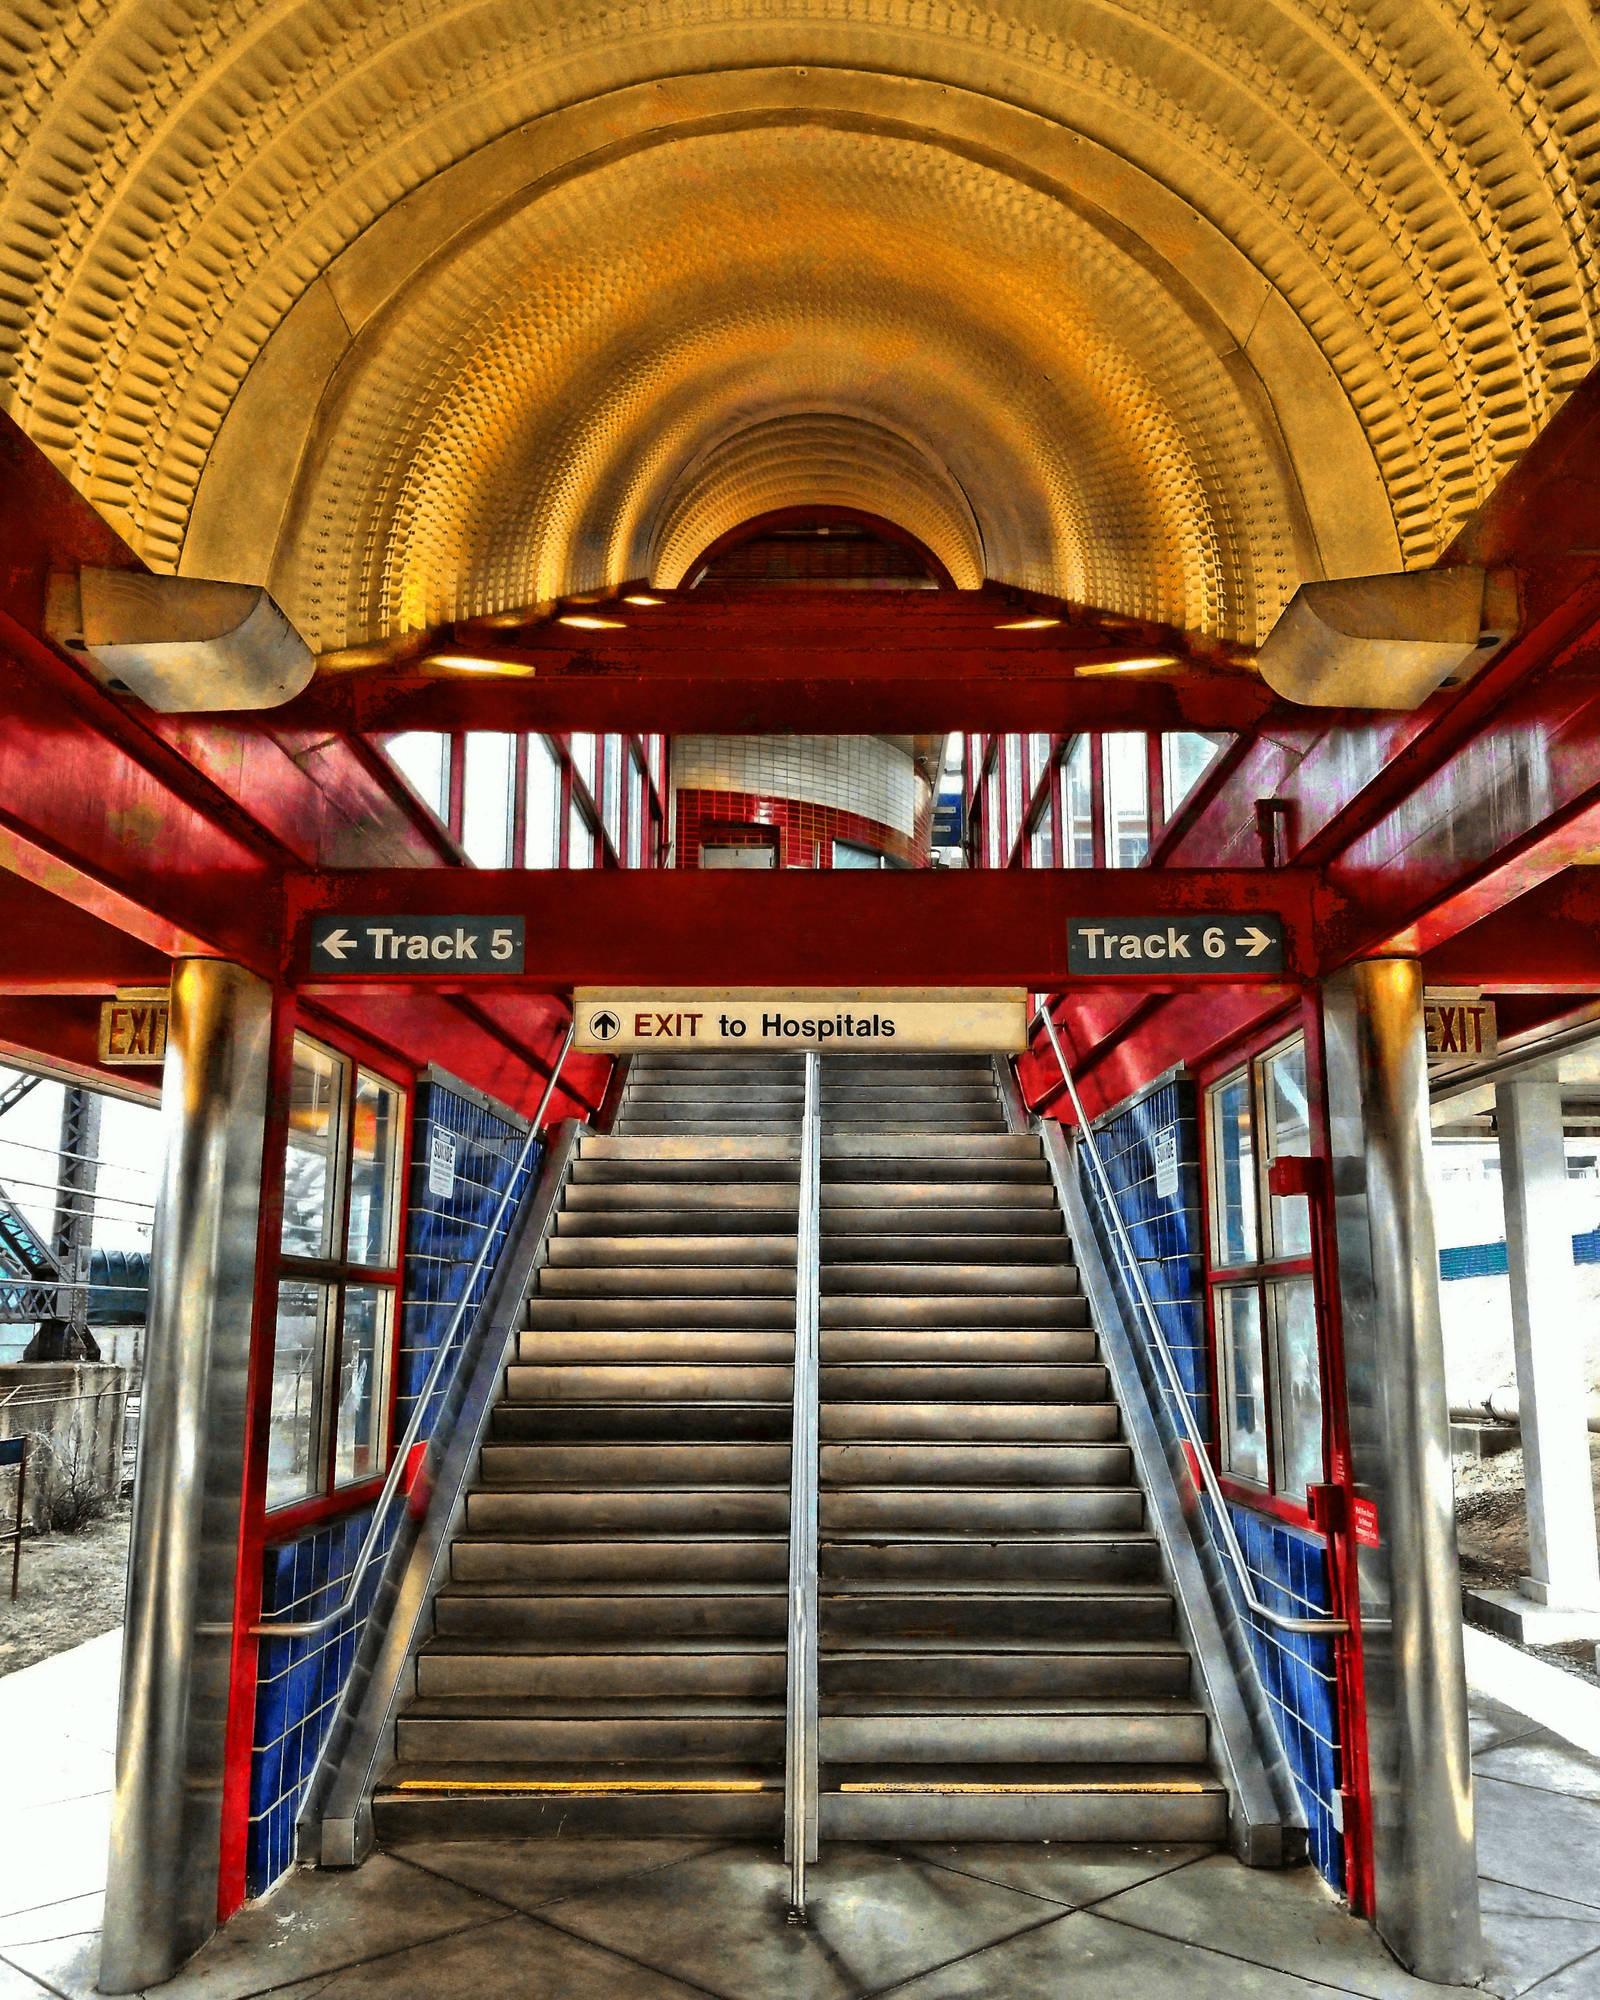 SEPTA University City Station by bruhinb